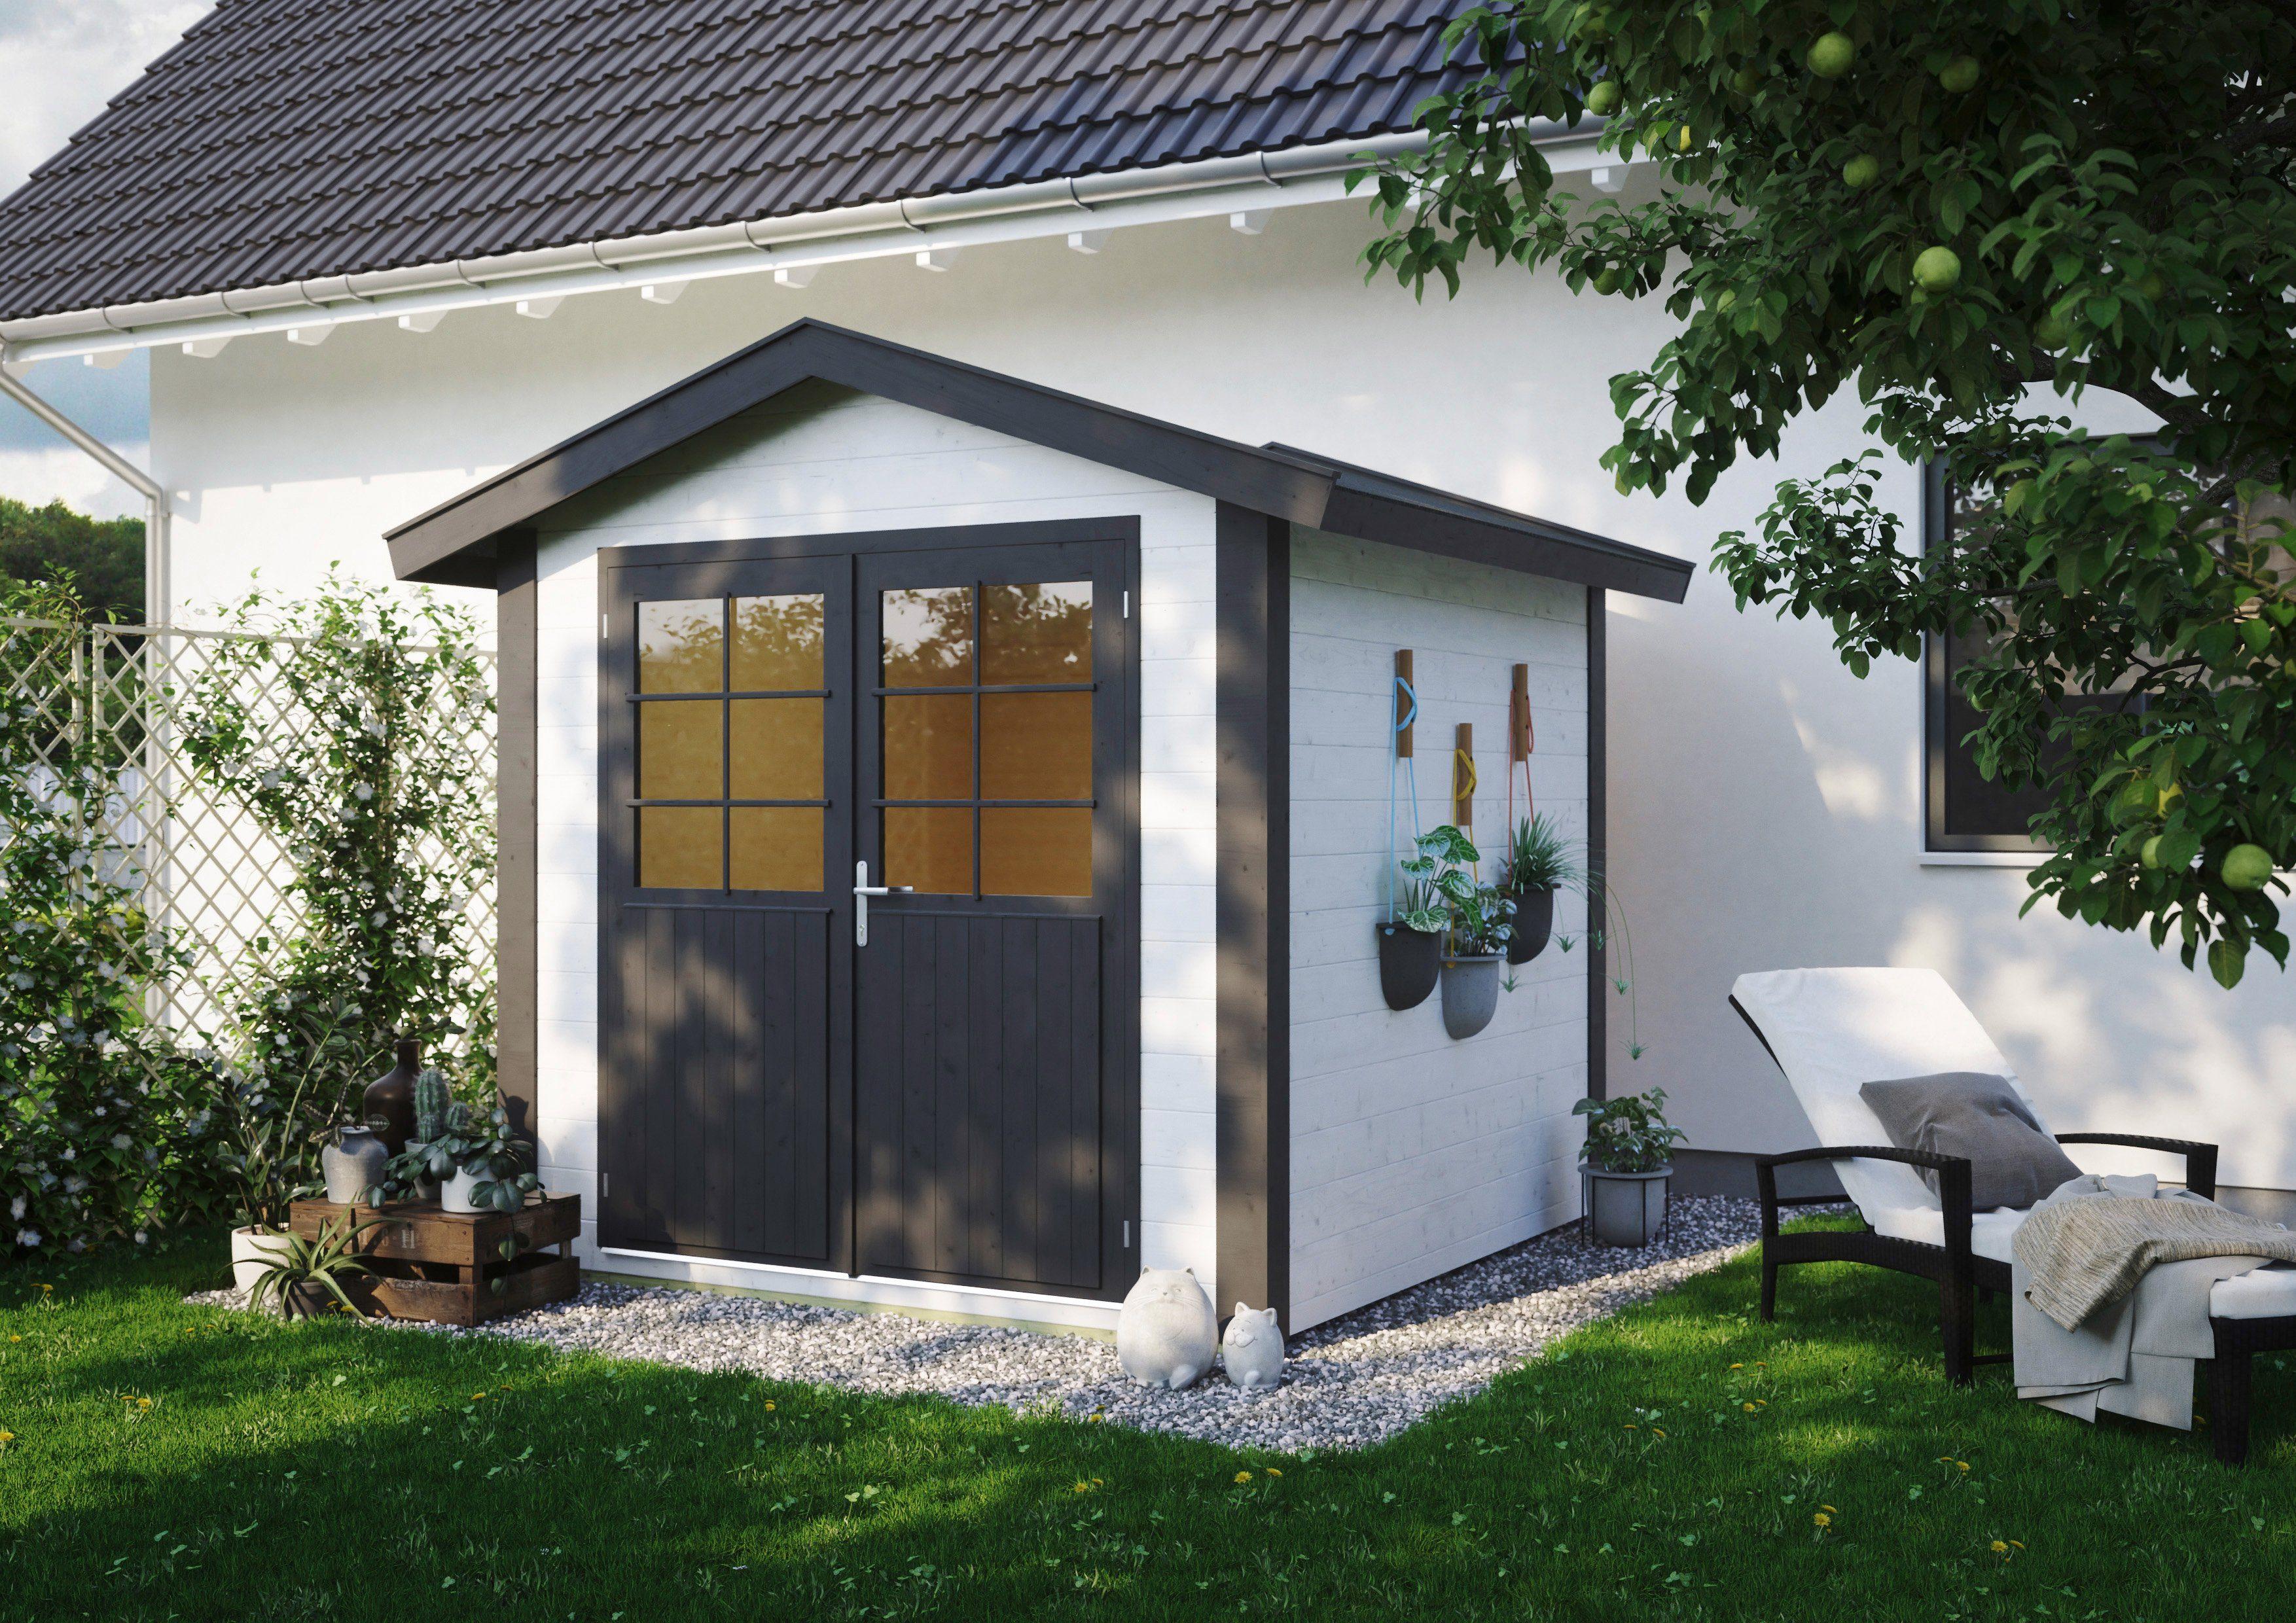 Gartenhaus Fußboden Aufbau ~ Luoman gartenhaus lillevilla « bxt cm inkl aufbau